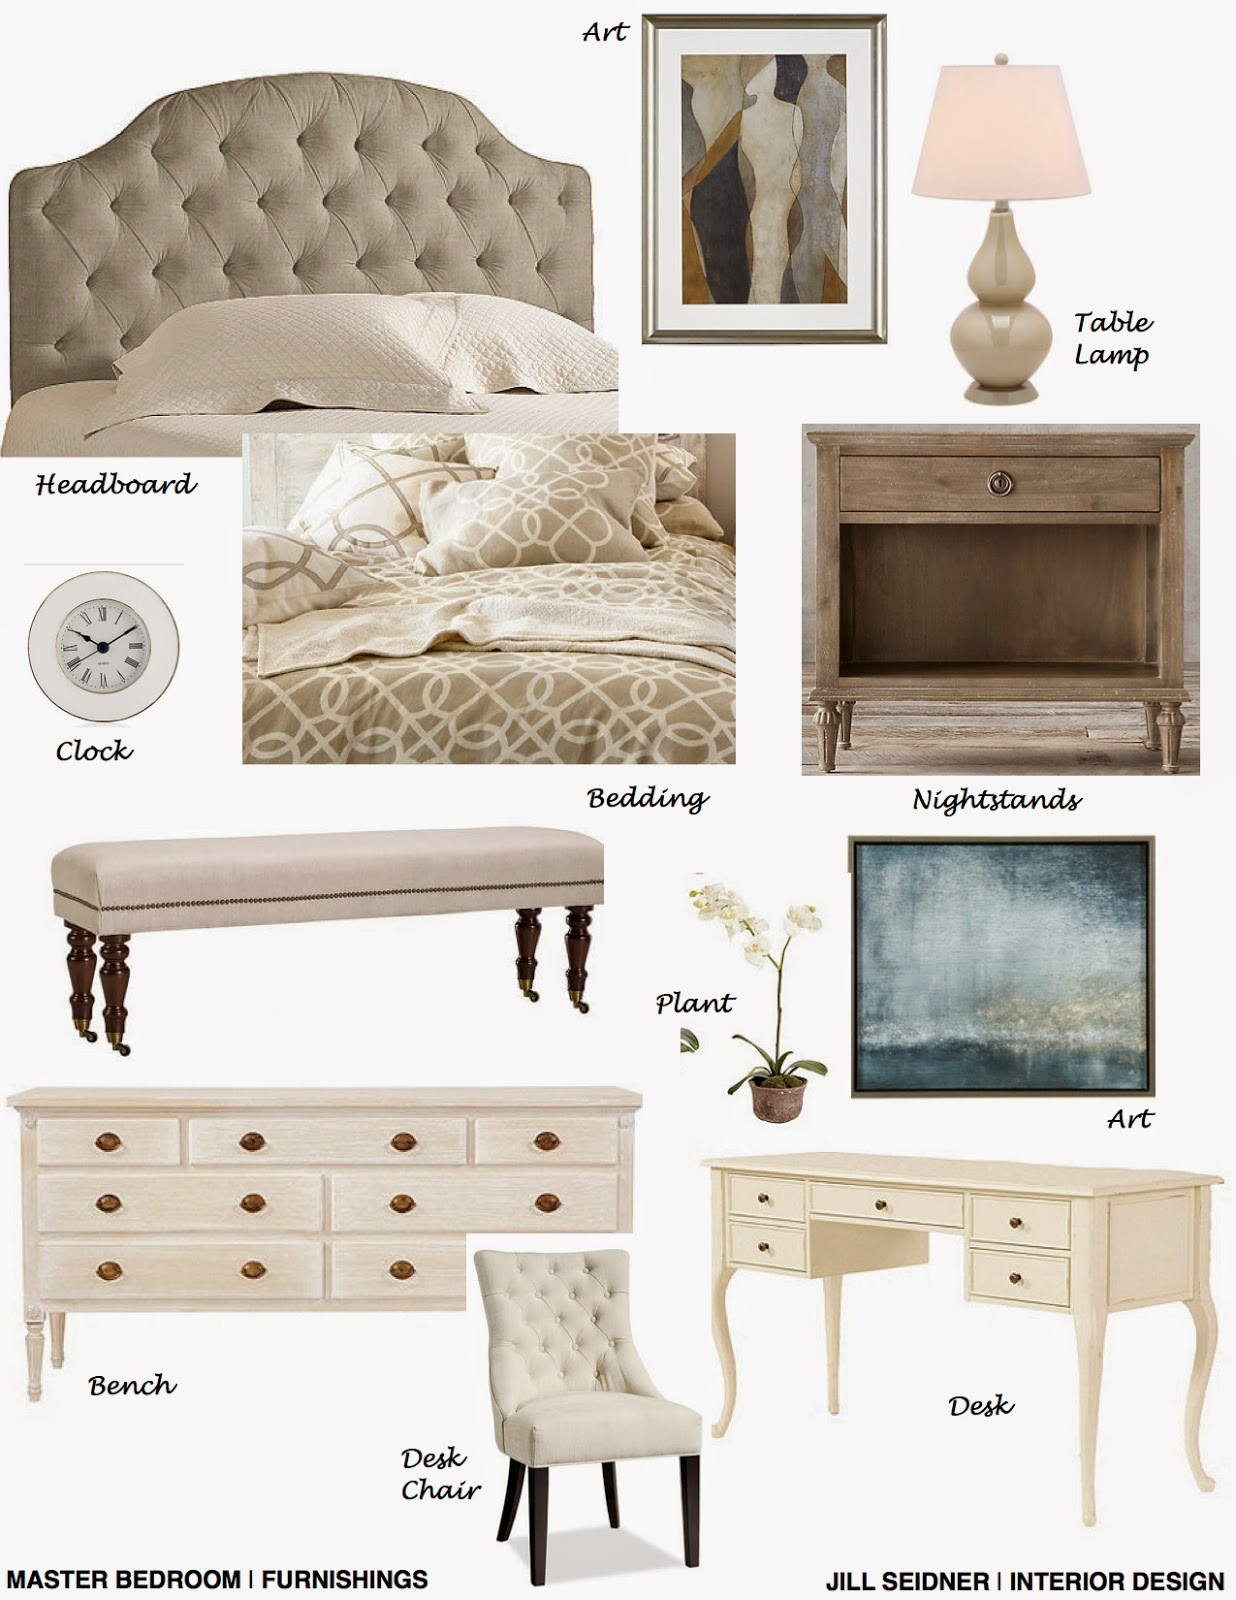 Concept Interior Design Furniture ~ Jill seidner interior design concept boards